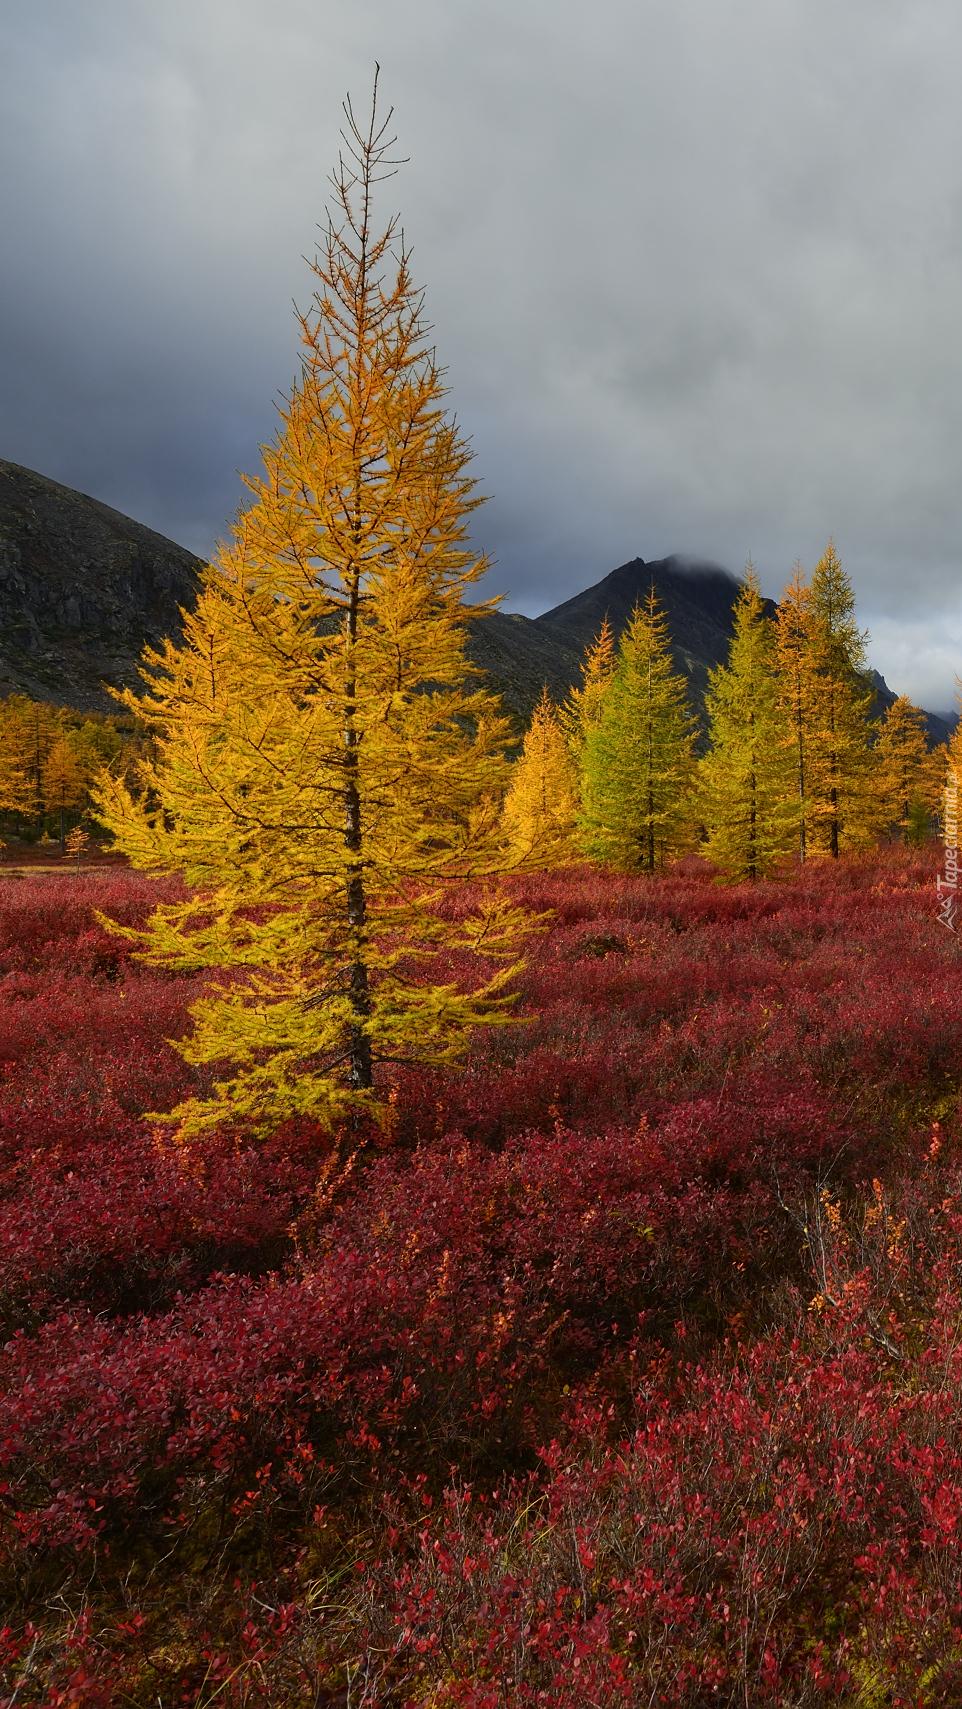 Jesienny górski krajobraz